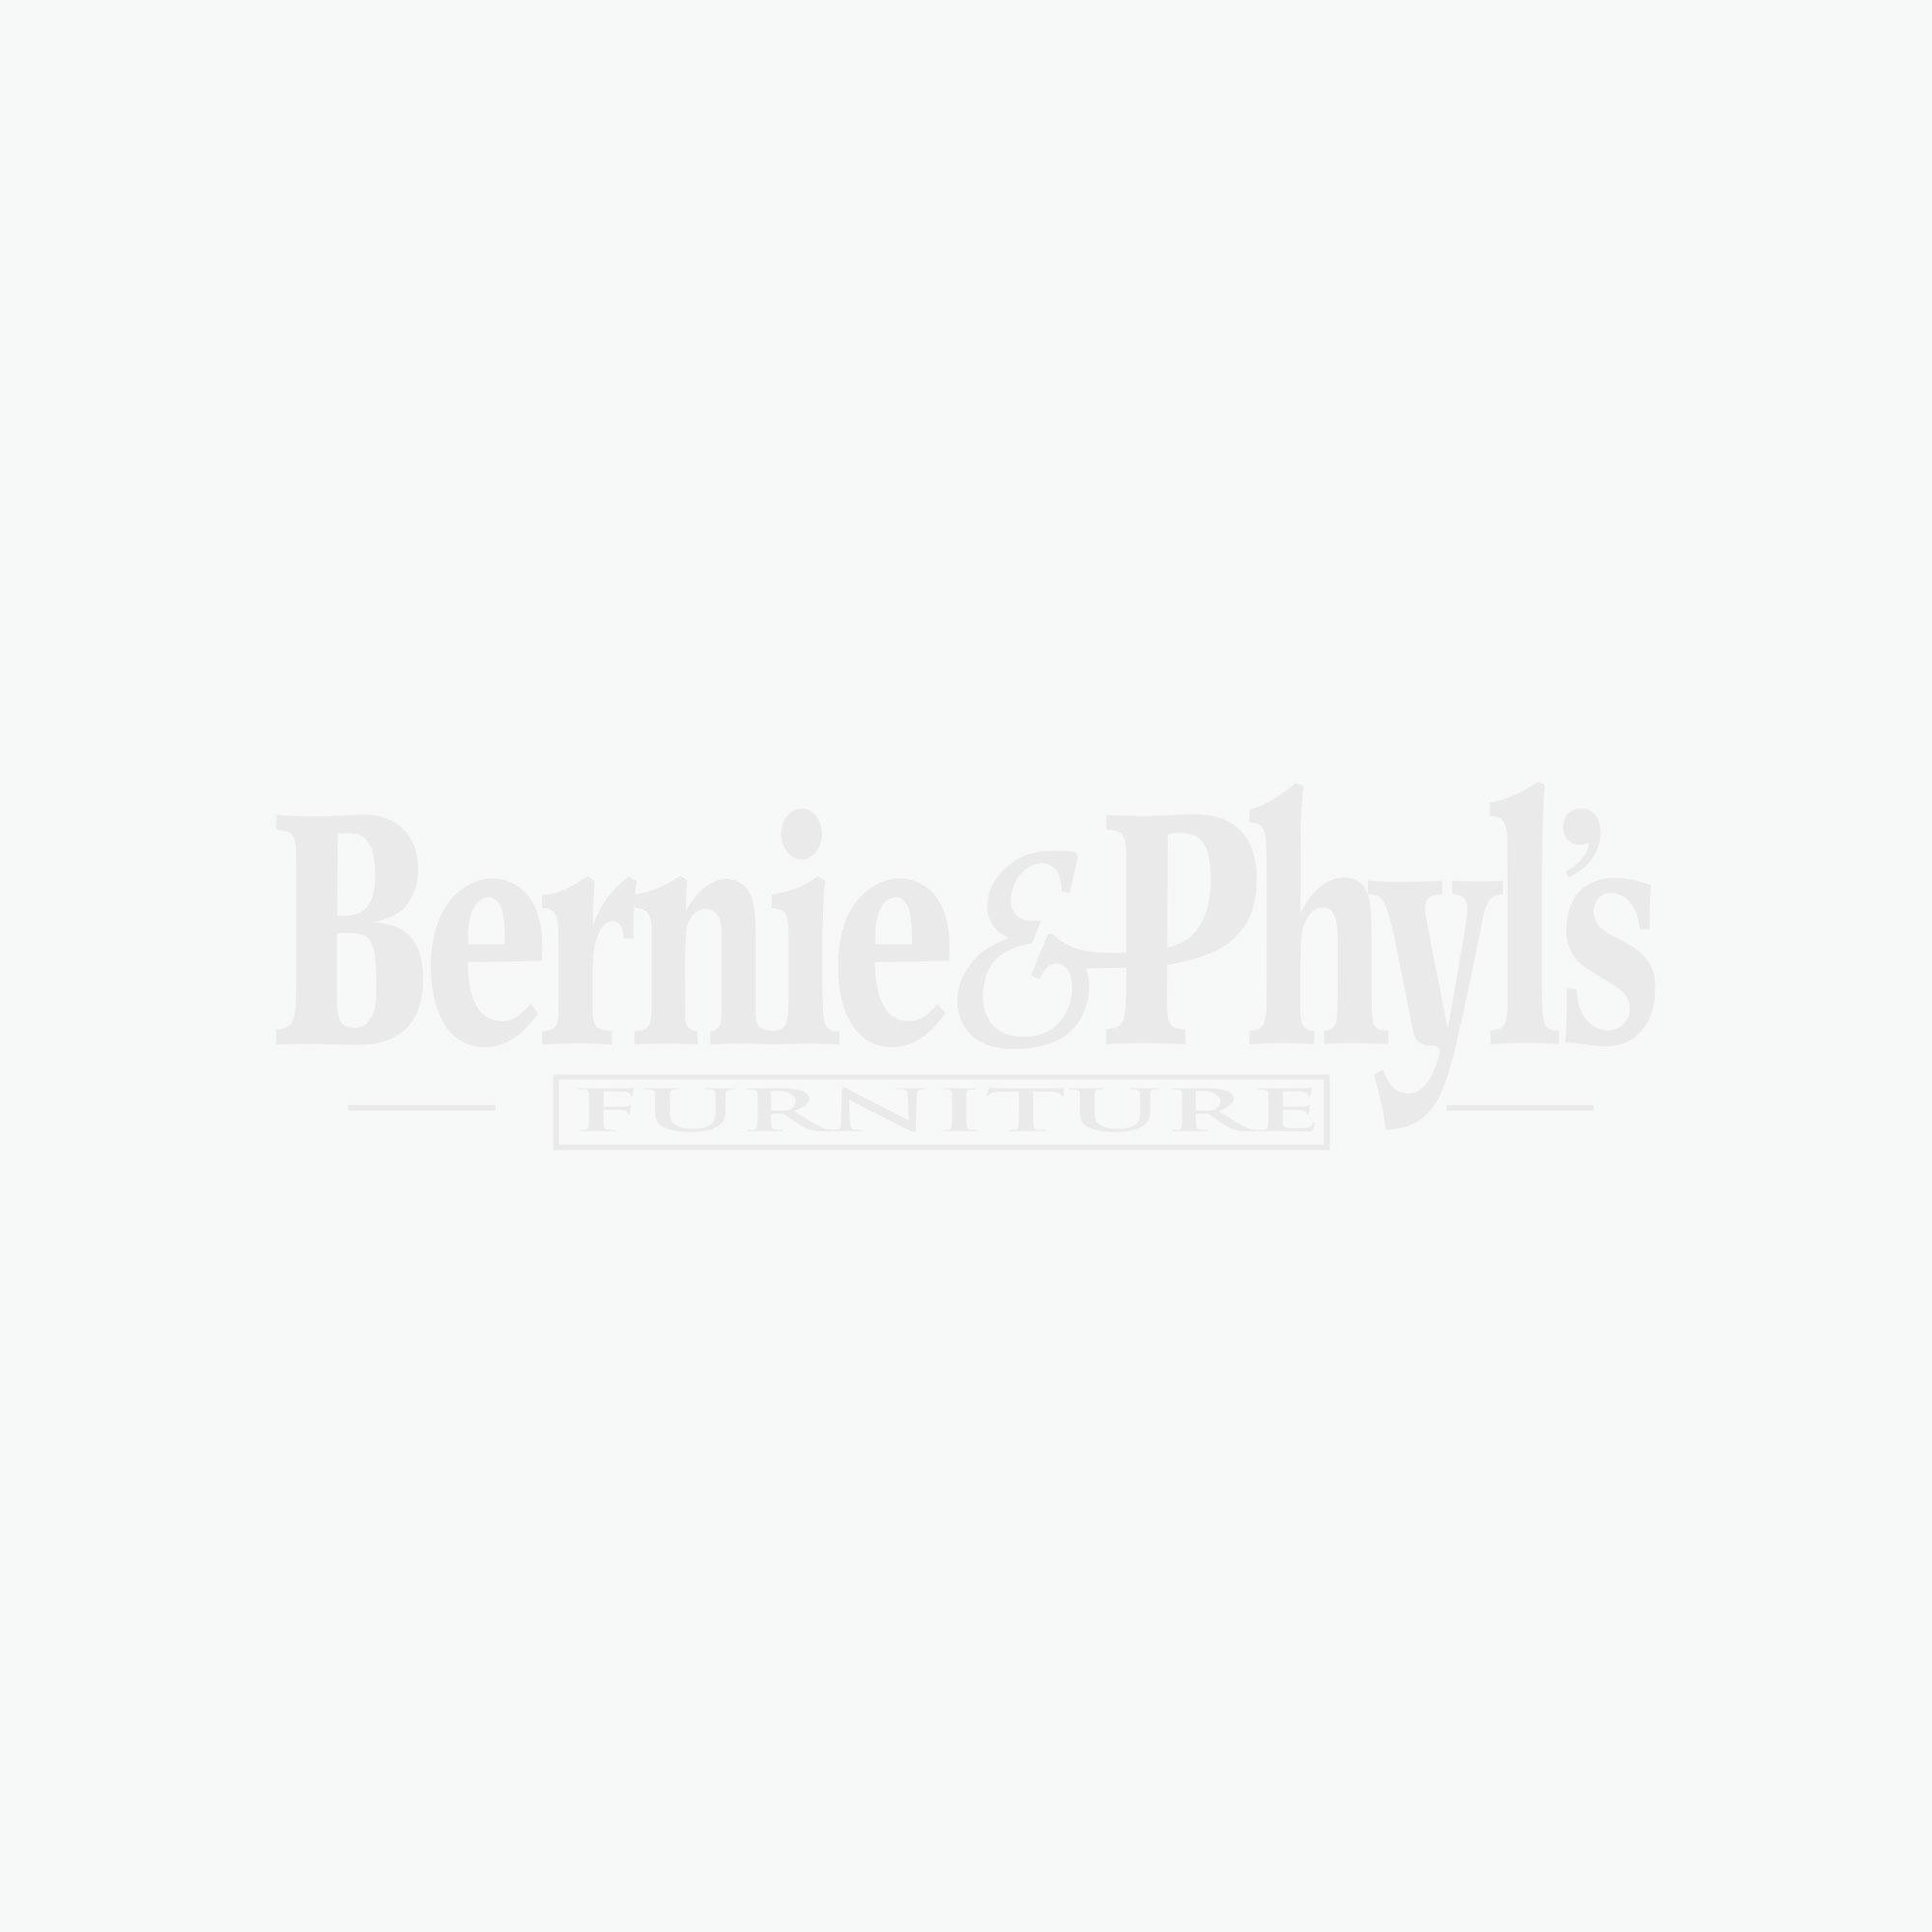 Malibu 3 Piece Sleeper Sectional Bernie & Phyl s Furniture by